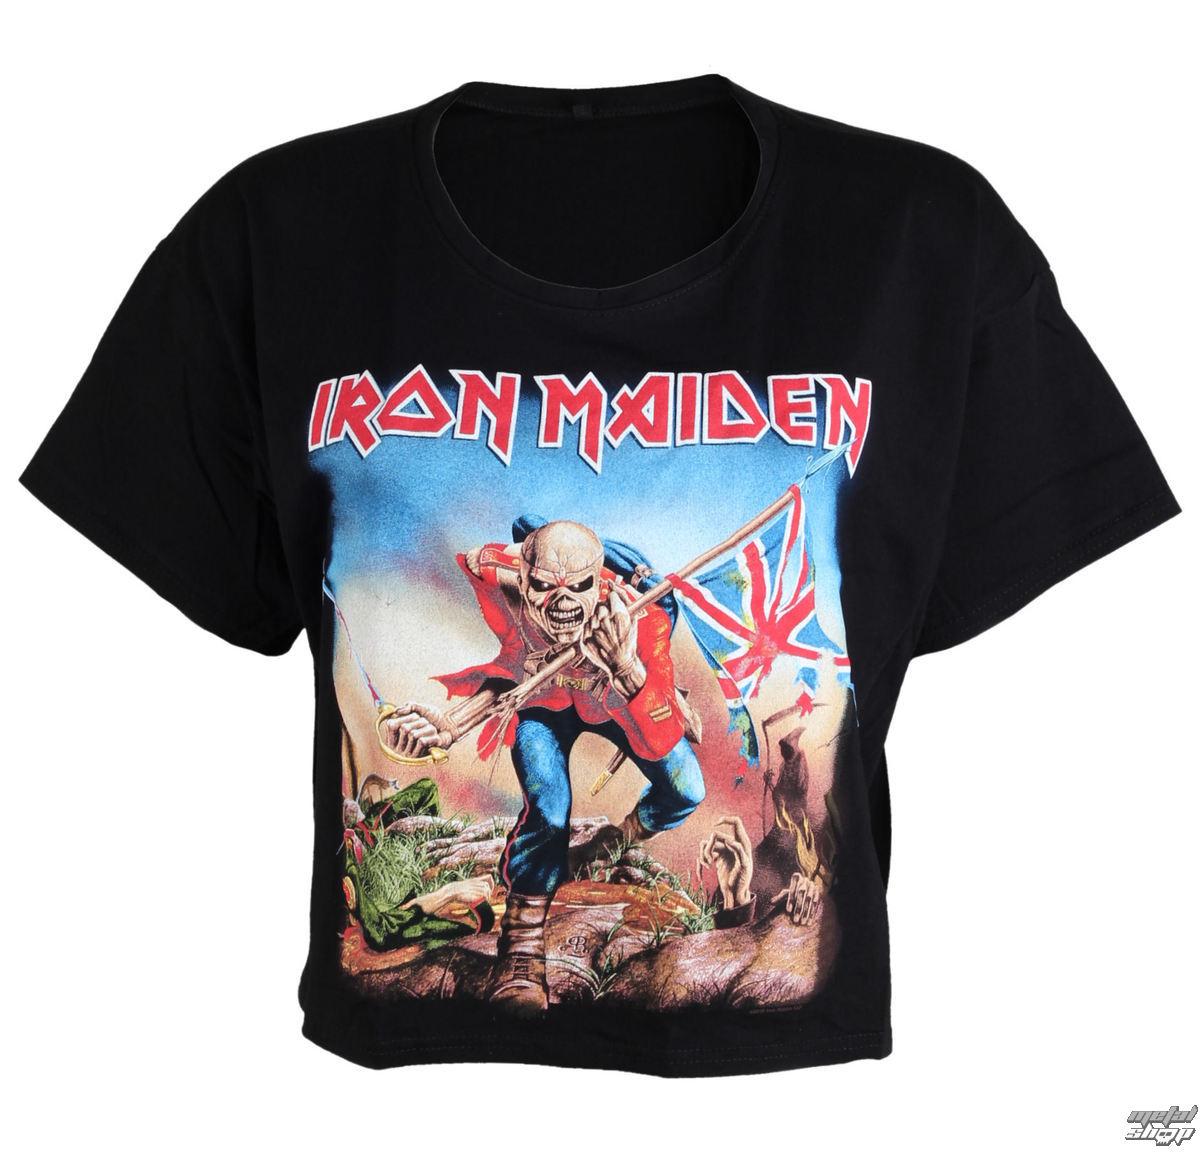 metál póló női Iron Maiden - Trooper - ROCK OFF - IMPBT01LB ... 3bf4c87db6